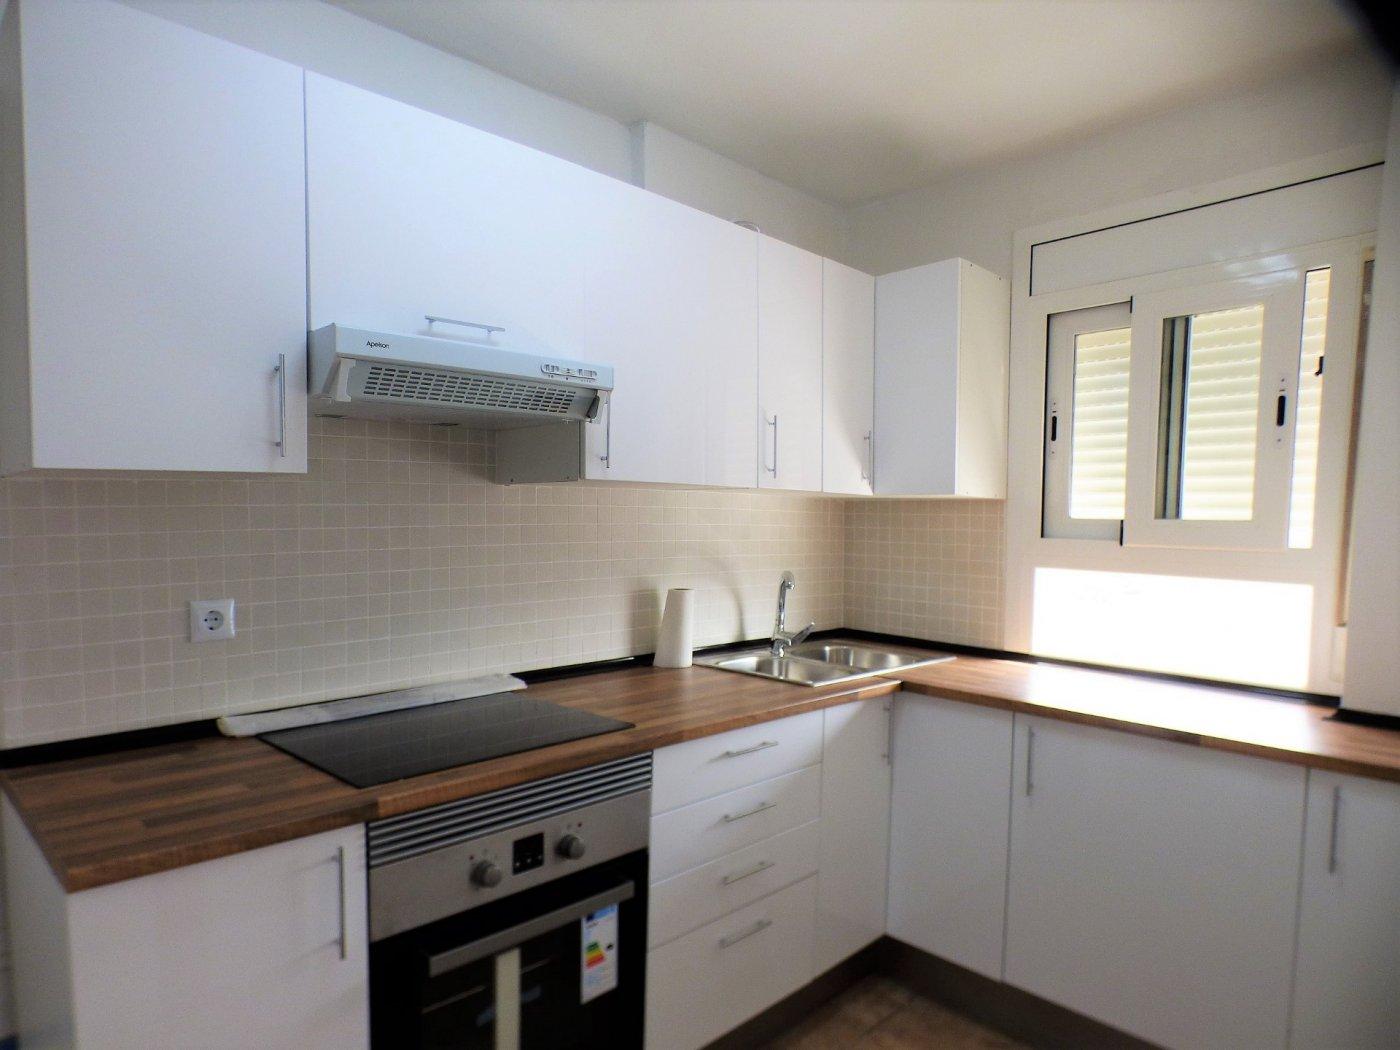 piso en sant-joan-de-vilatorrada · torrent-del-canigo 495€